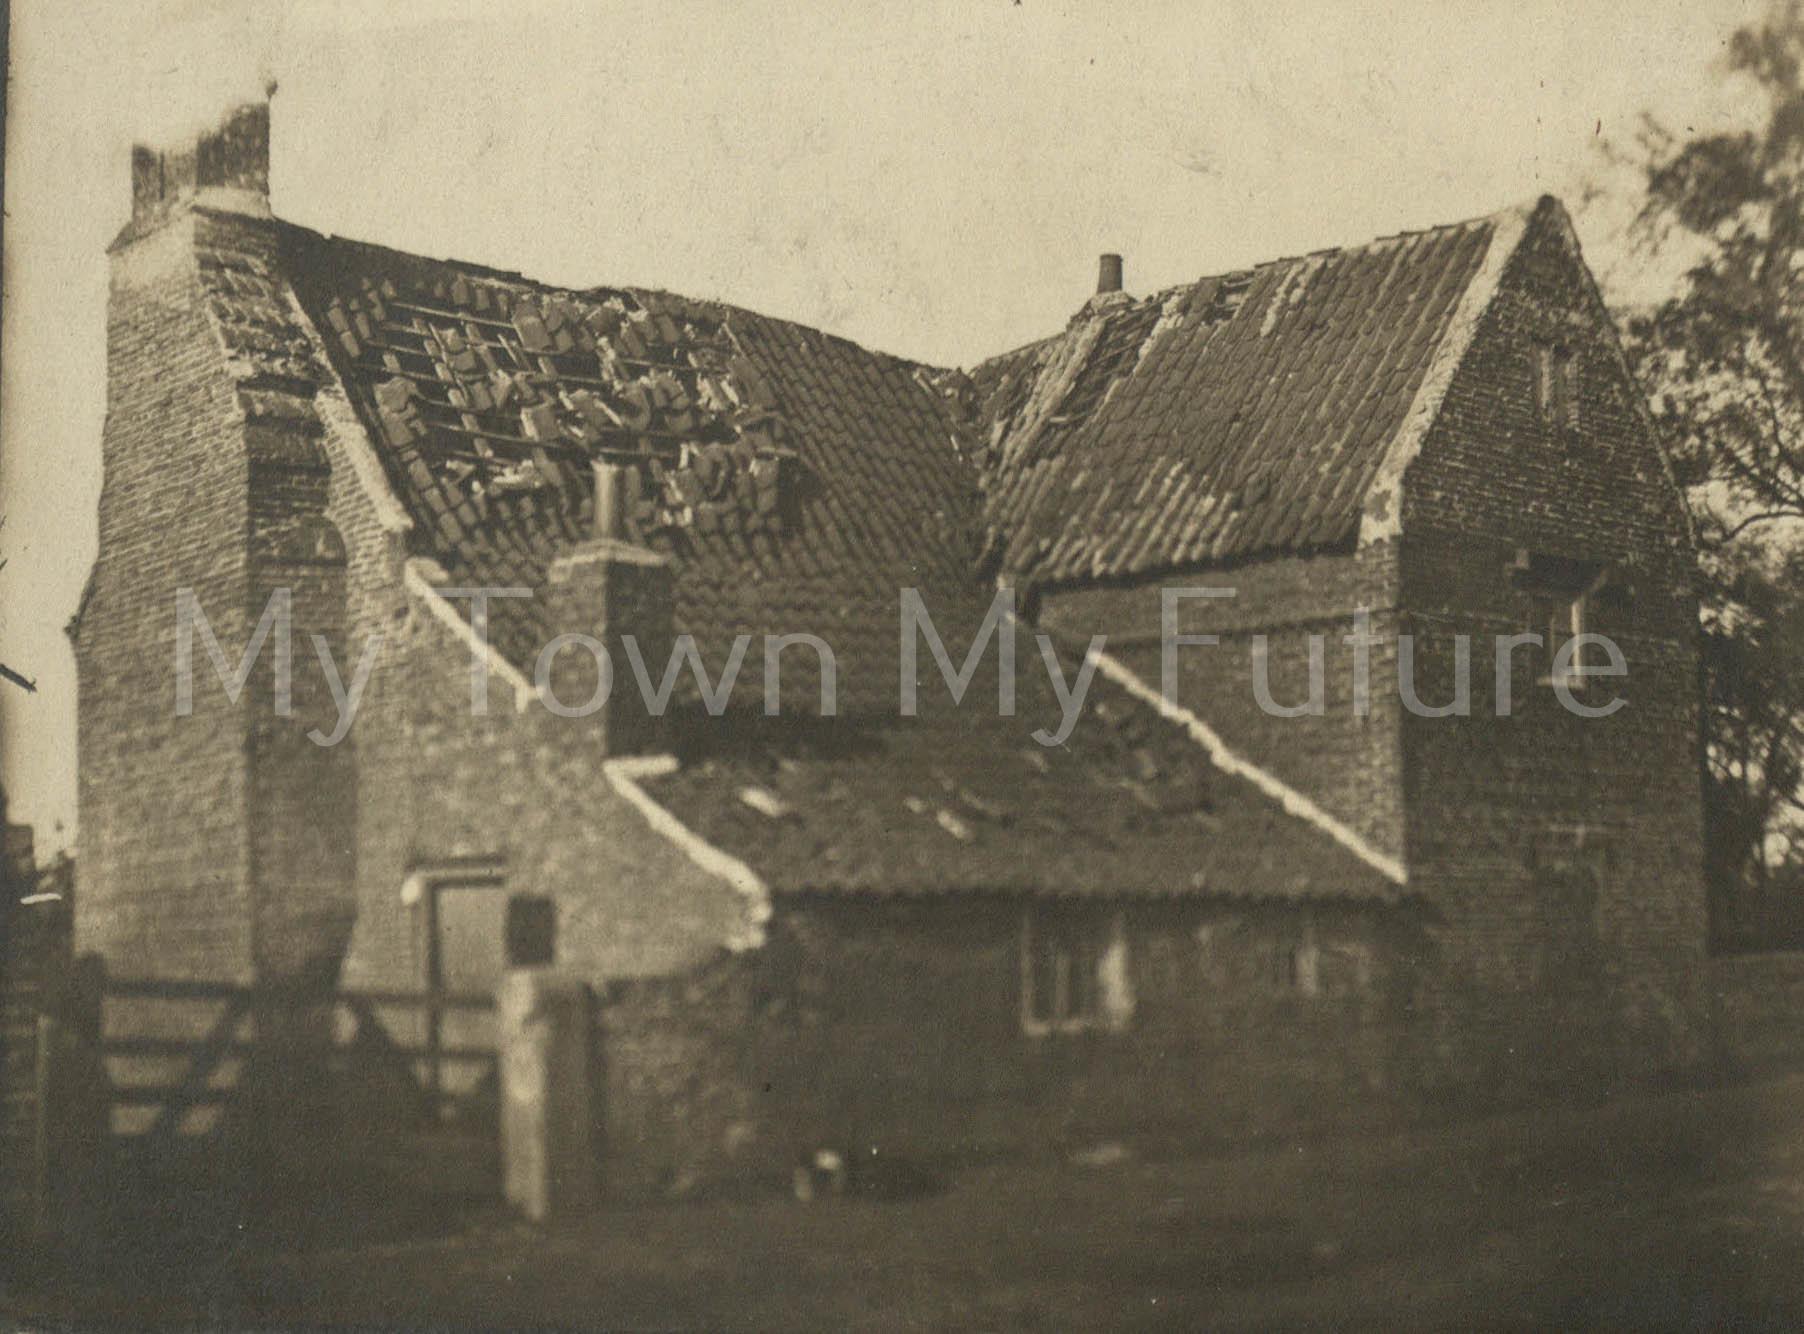 Old Gate Farm, Kensington Road, Middlesbrough - Middlesbrough Public Libraries